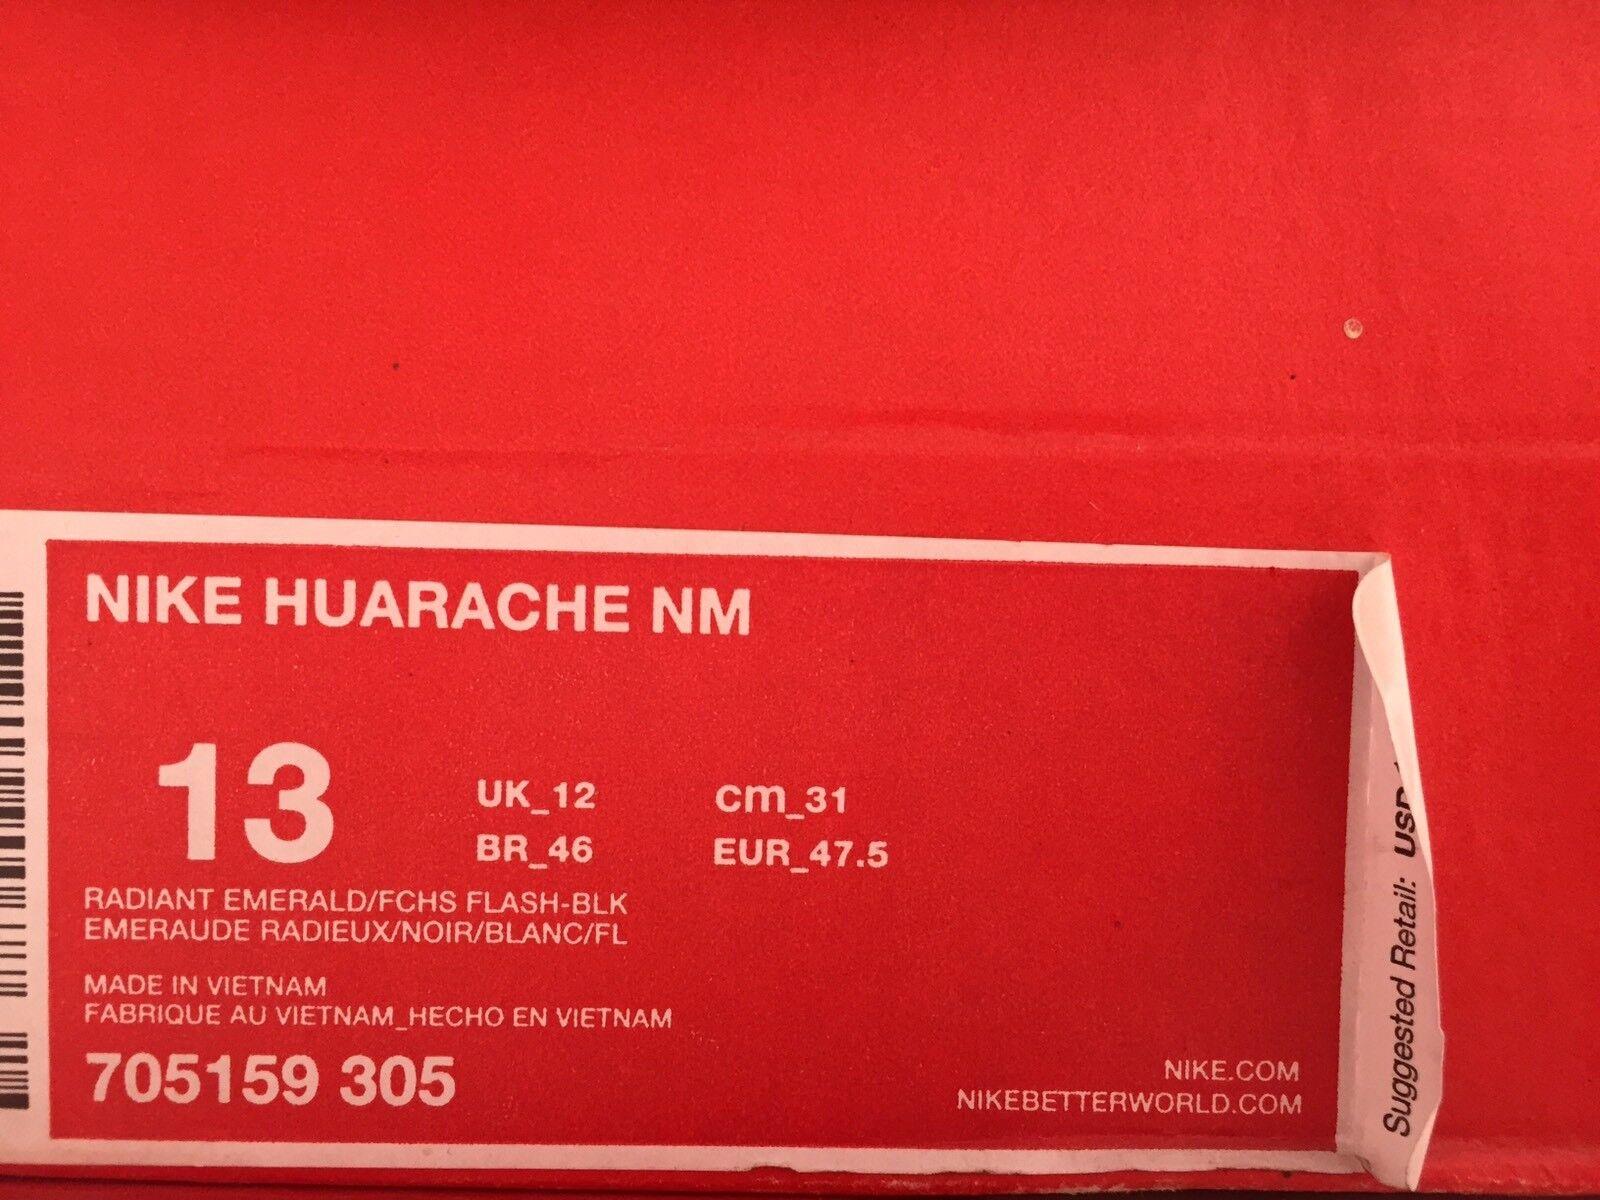 nike huarache émeraude nm 13 vert émeraude huarache violet blanc courir 705159-305 multicolore fuchsia 737fda